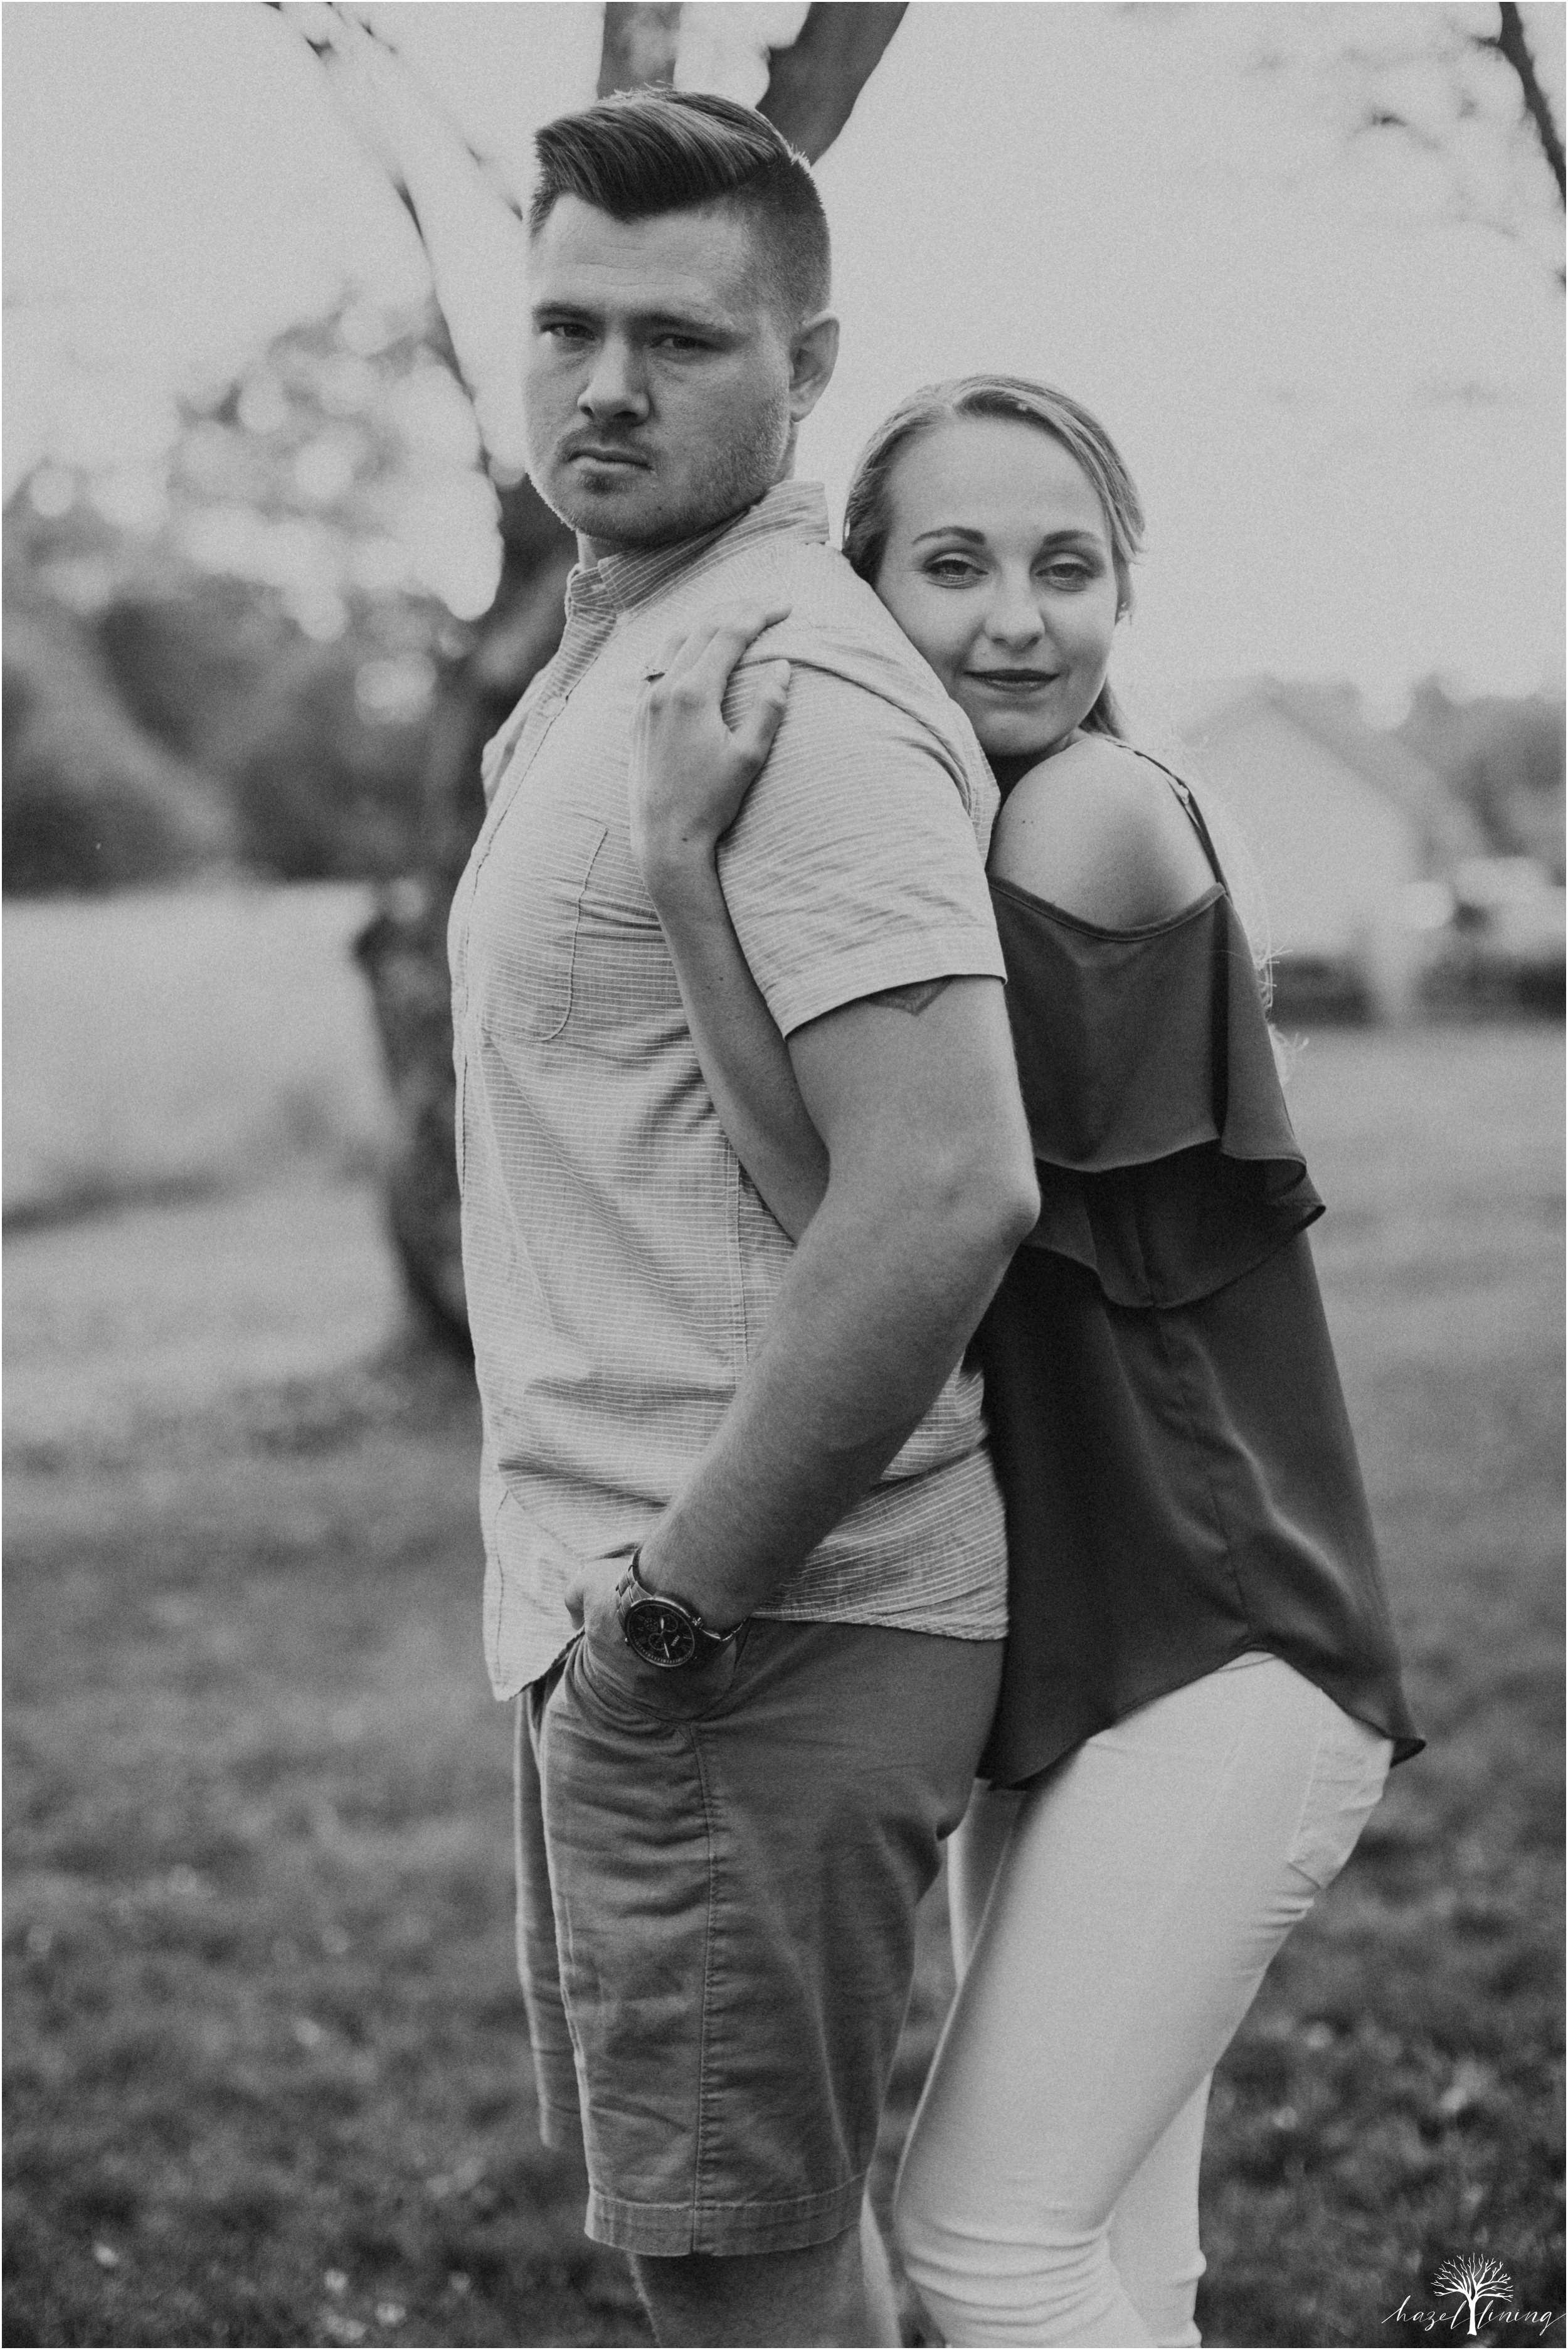 rachel-warner-chris-niedrist-the-farm-bakery-and-events-quakertown-pa-summer-engagement-hazel-lining-photography-destination-elopement-wedding-engagement-photography_0073.jpg